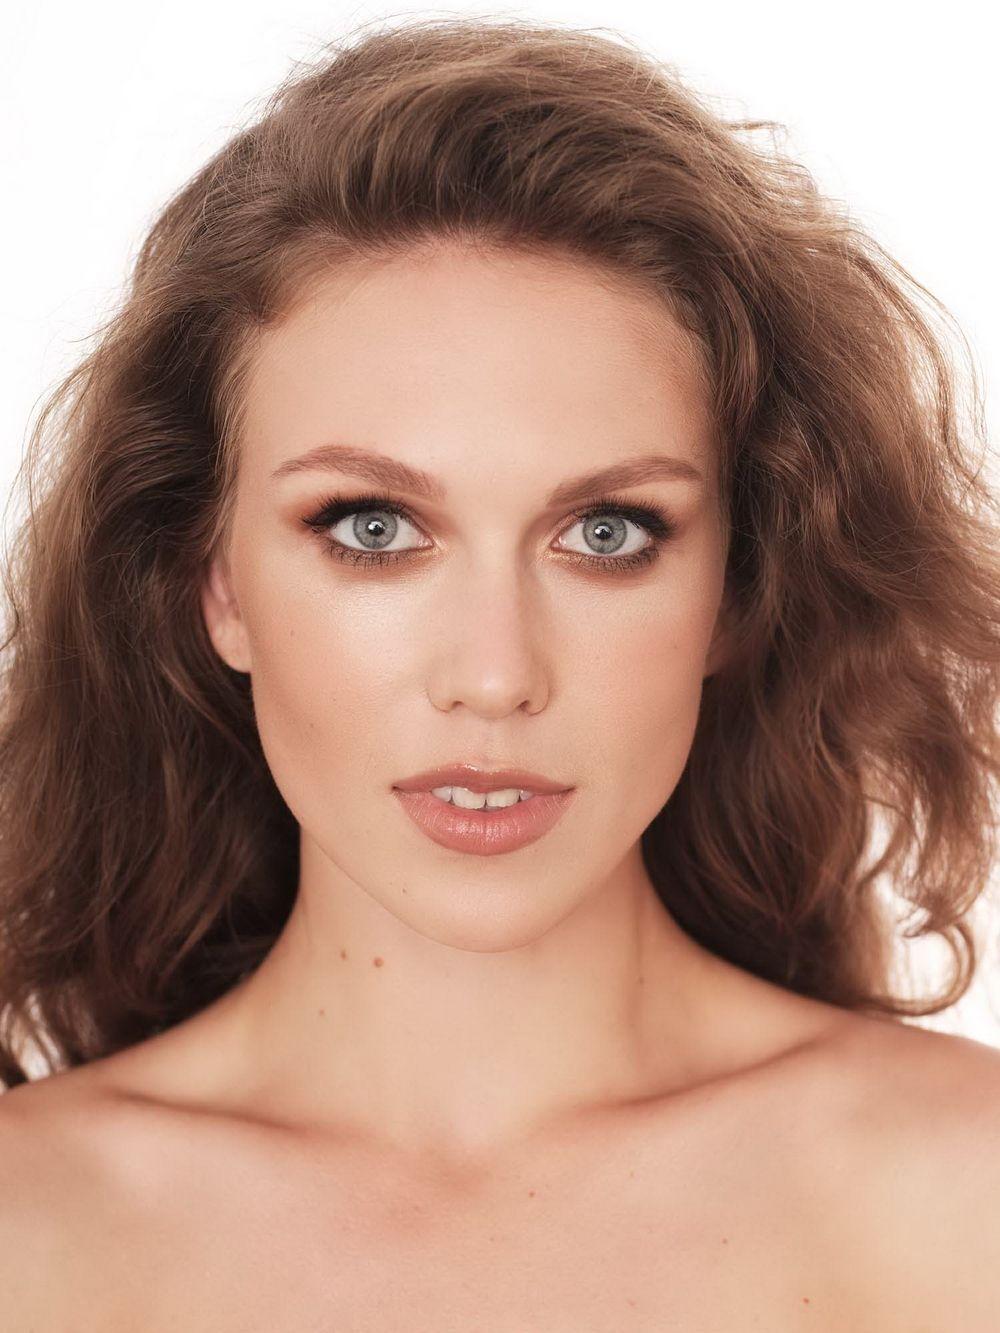 №14. Екатерина Кадникова. Возраст: 24 года. Рост: 173 см.